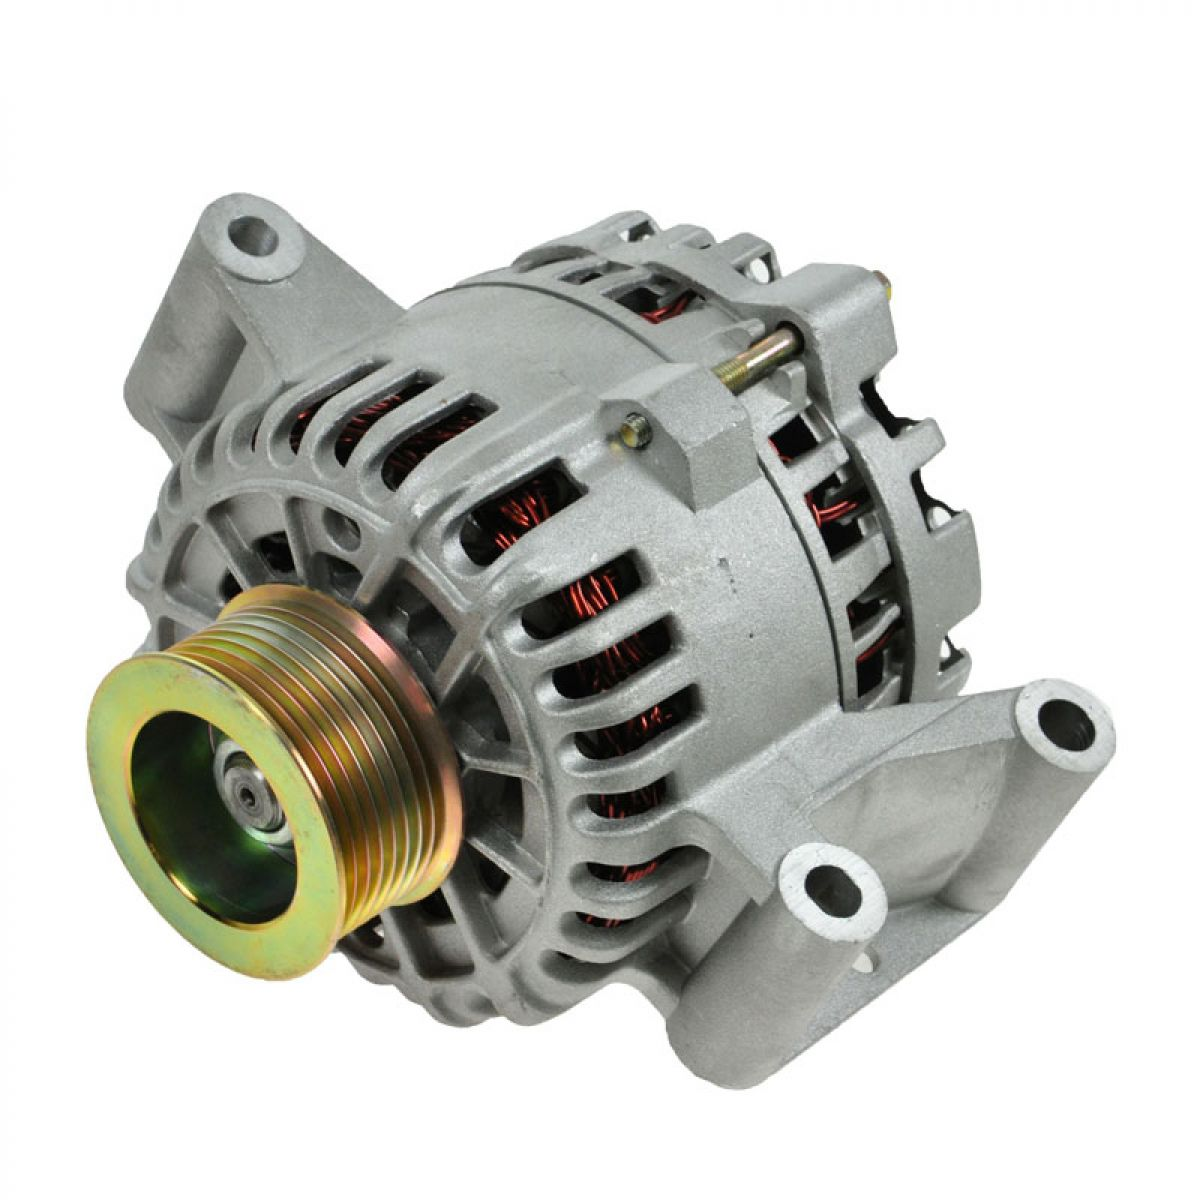 2003 Ford Windstar Parts Diagram Detailed Schematics Engine Manual 2000 Hose